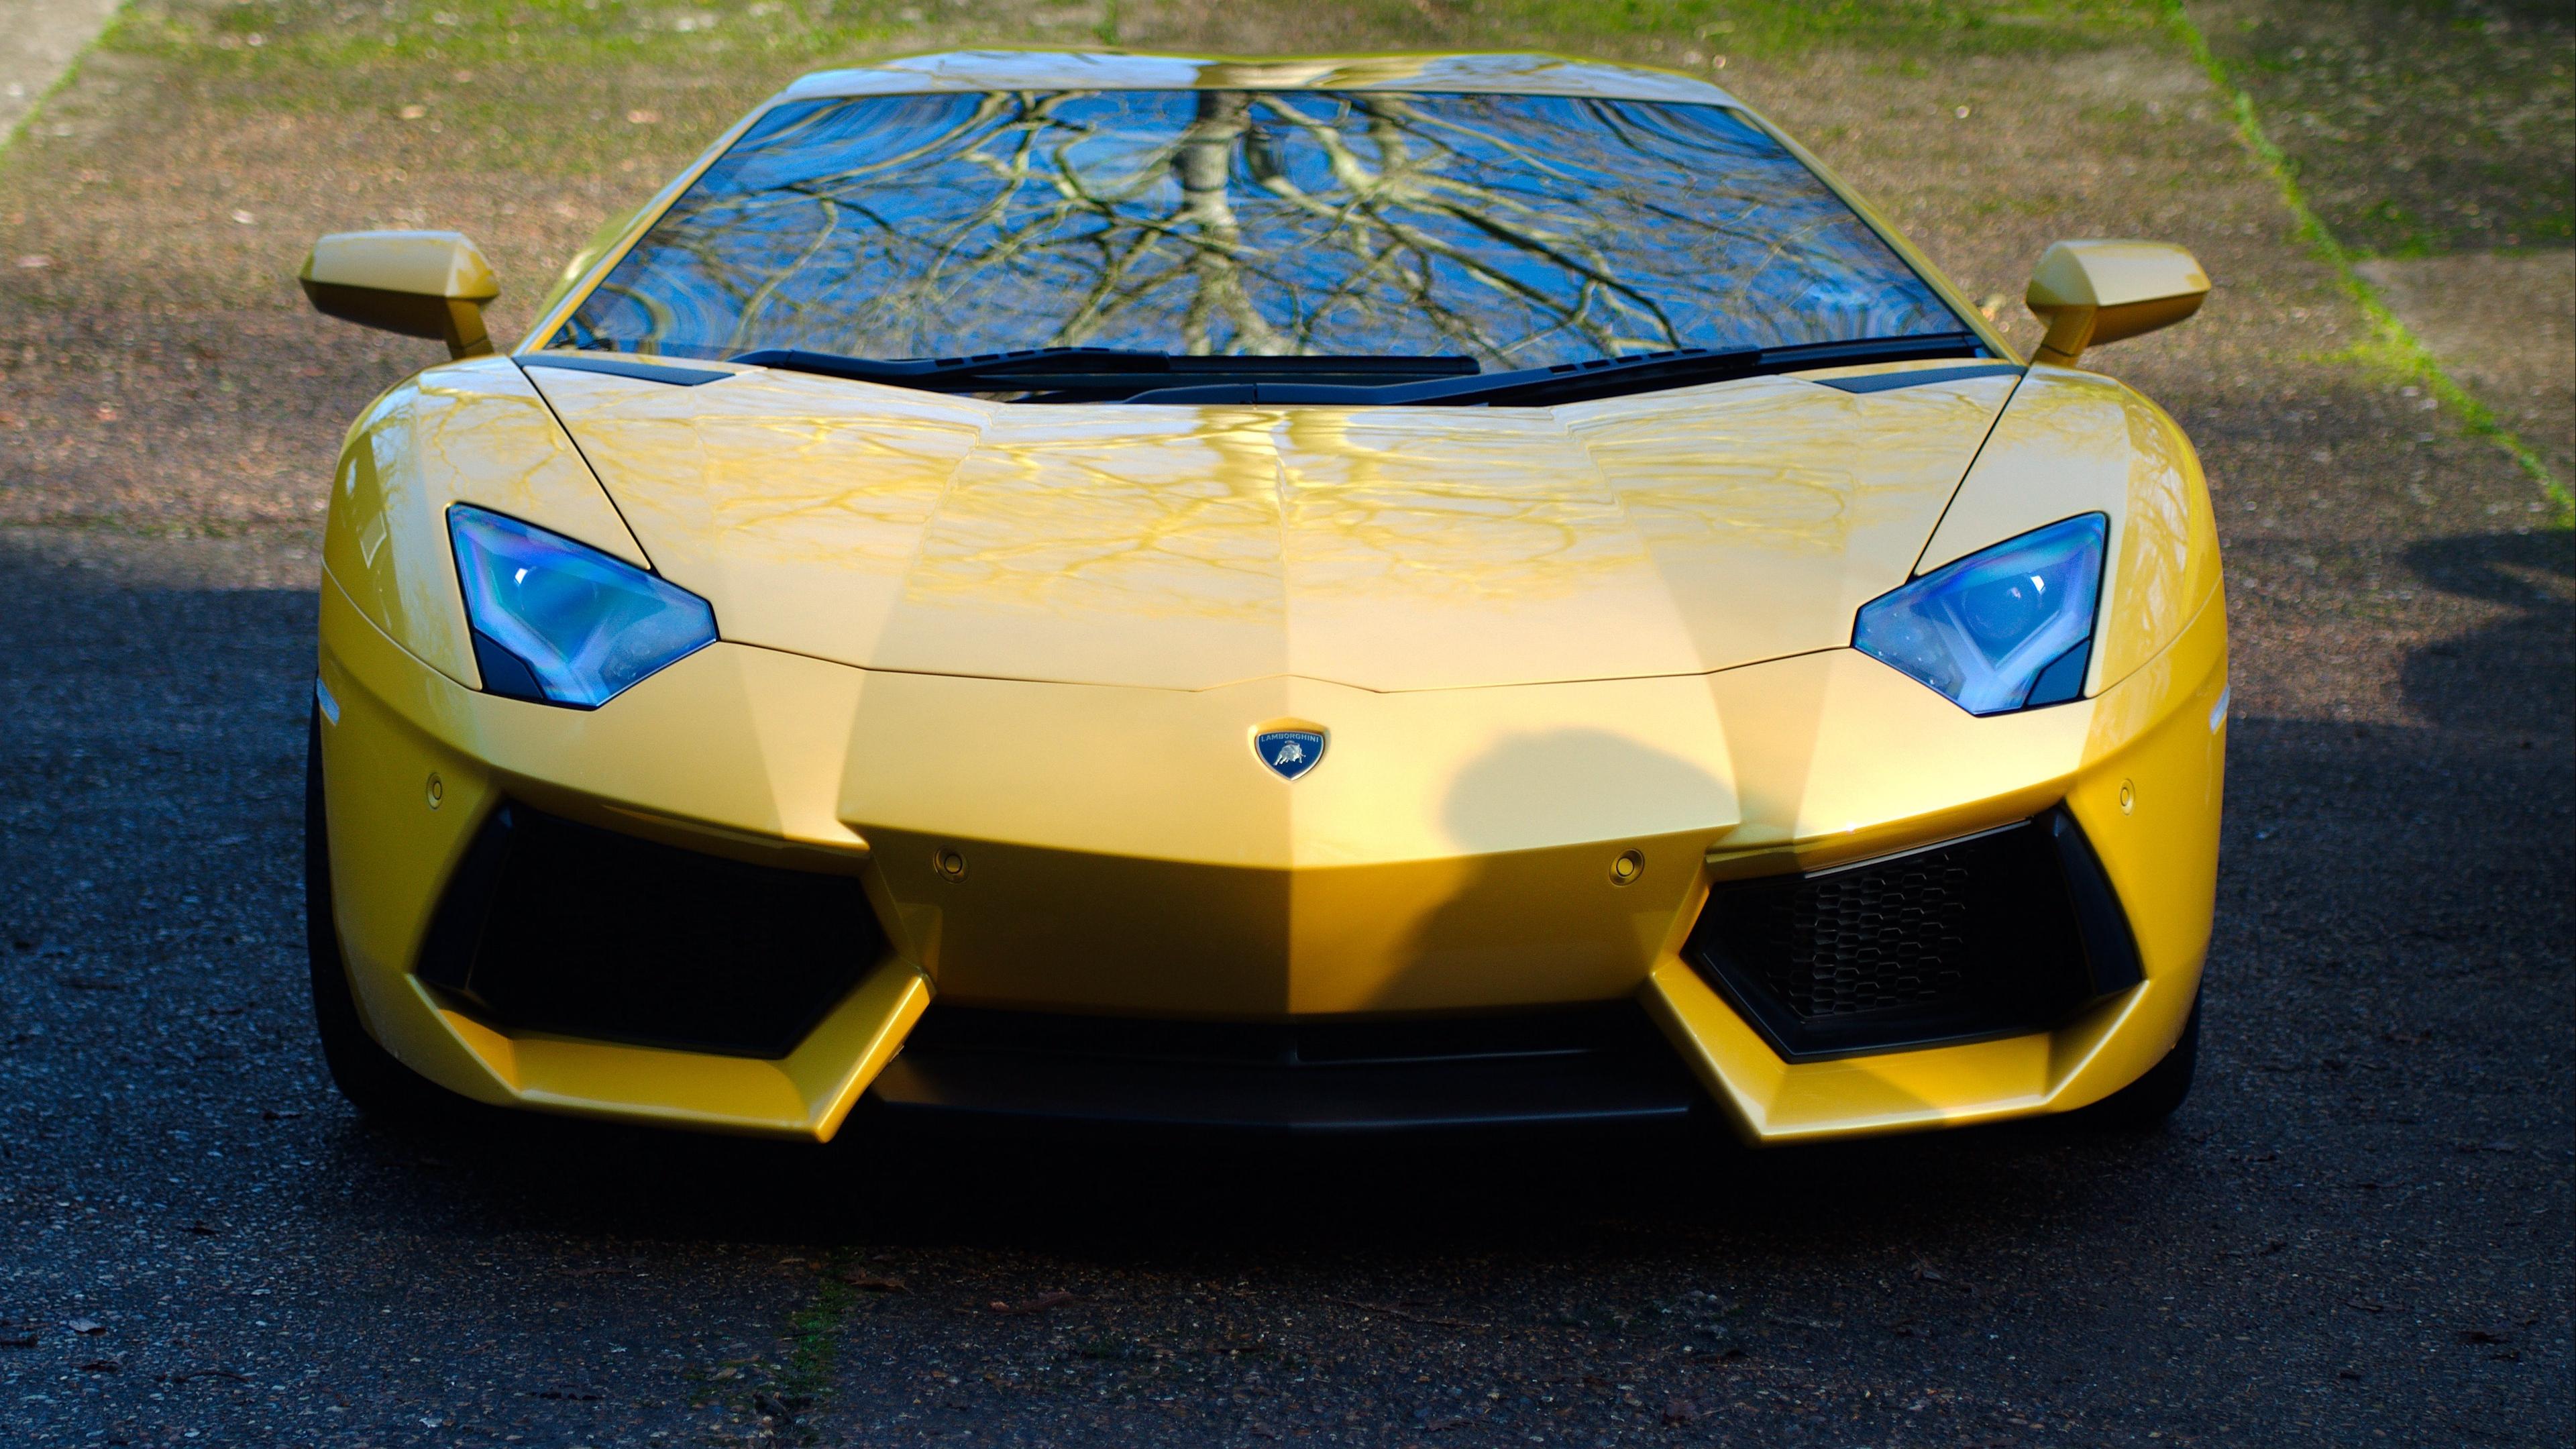 lamborghini aventador lp700 4 yellow car front view 4k 1538936349 - lamborghini, aventador, lp700-4, yellow, car, front view 4k - lp700-4, Lamborghini, Aventador